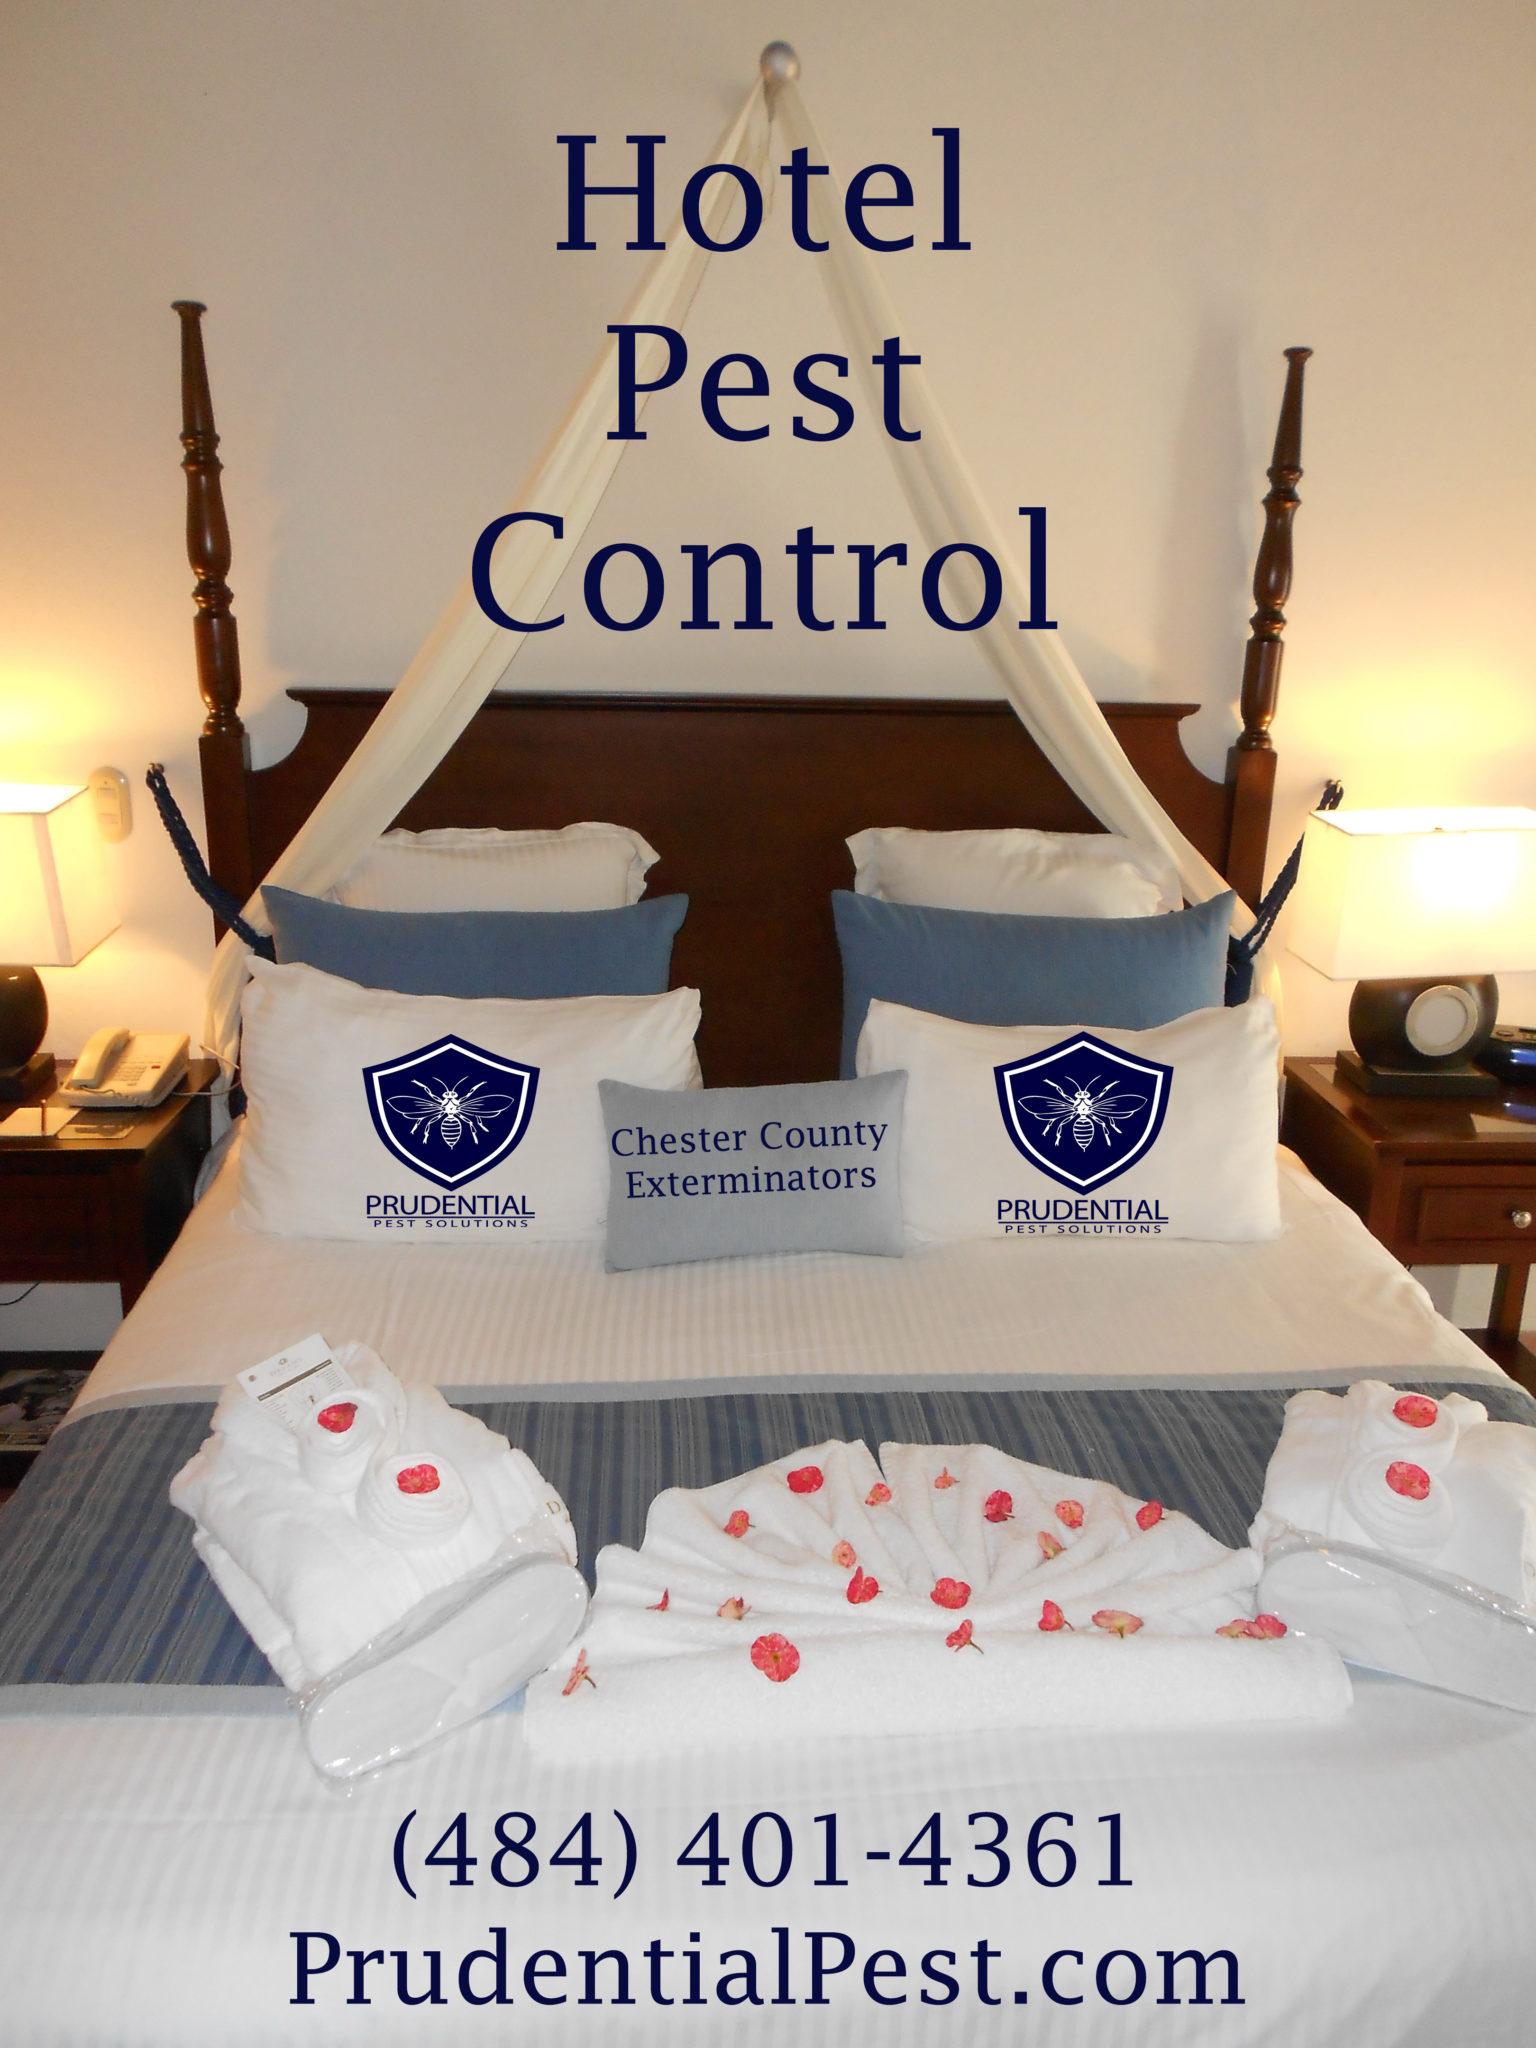 Hotel Pest Control